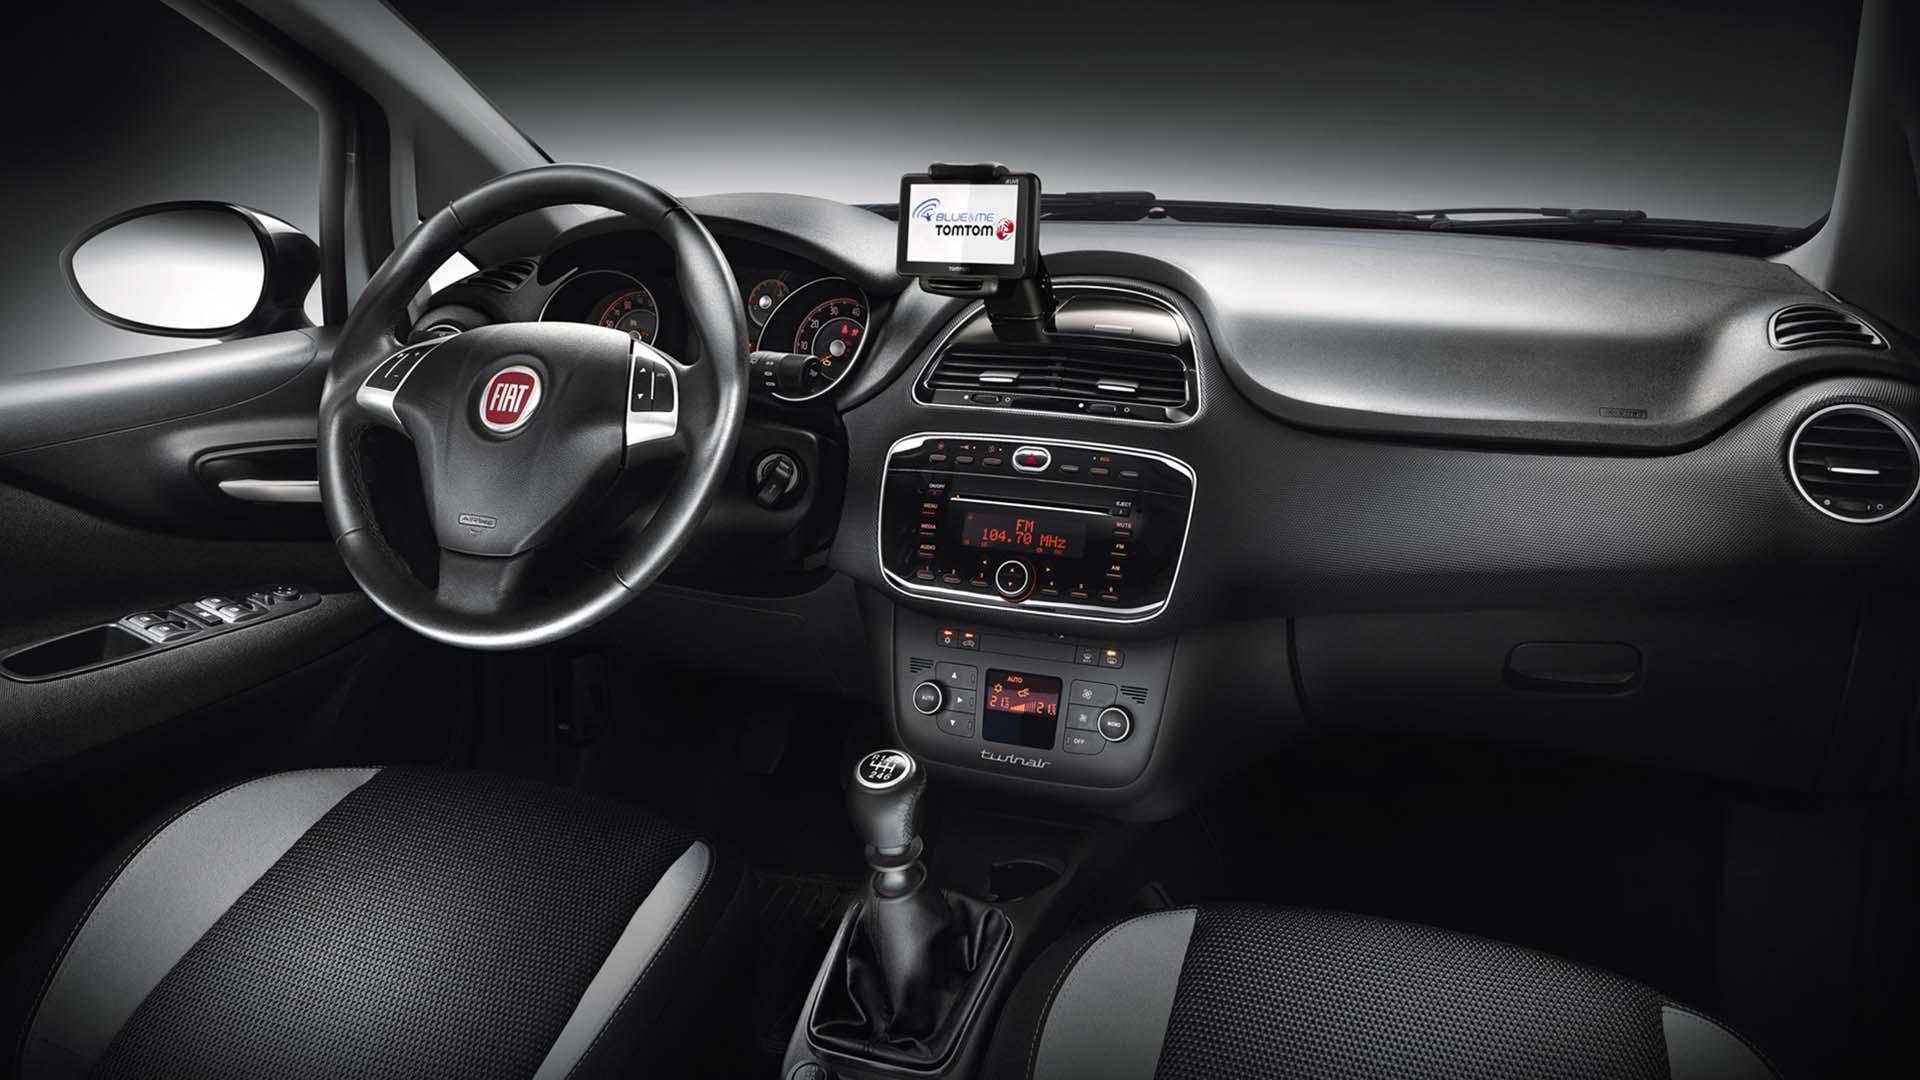 FIAT Punto 1.4 cc Auto | AQR | Auto Quality Rentals ...